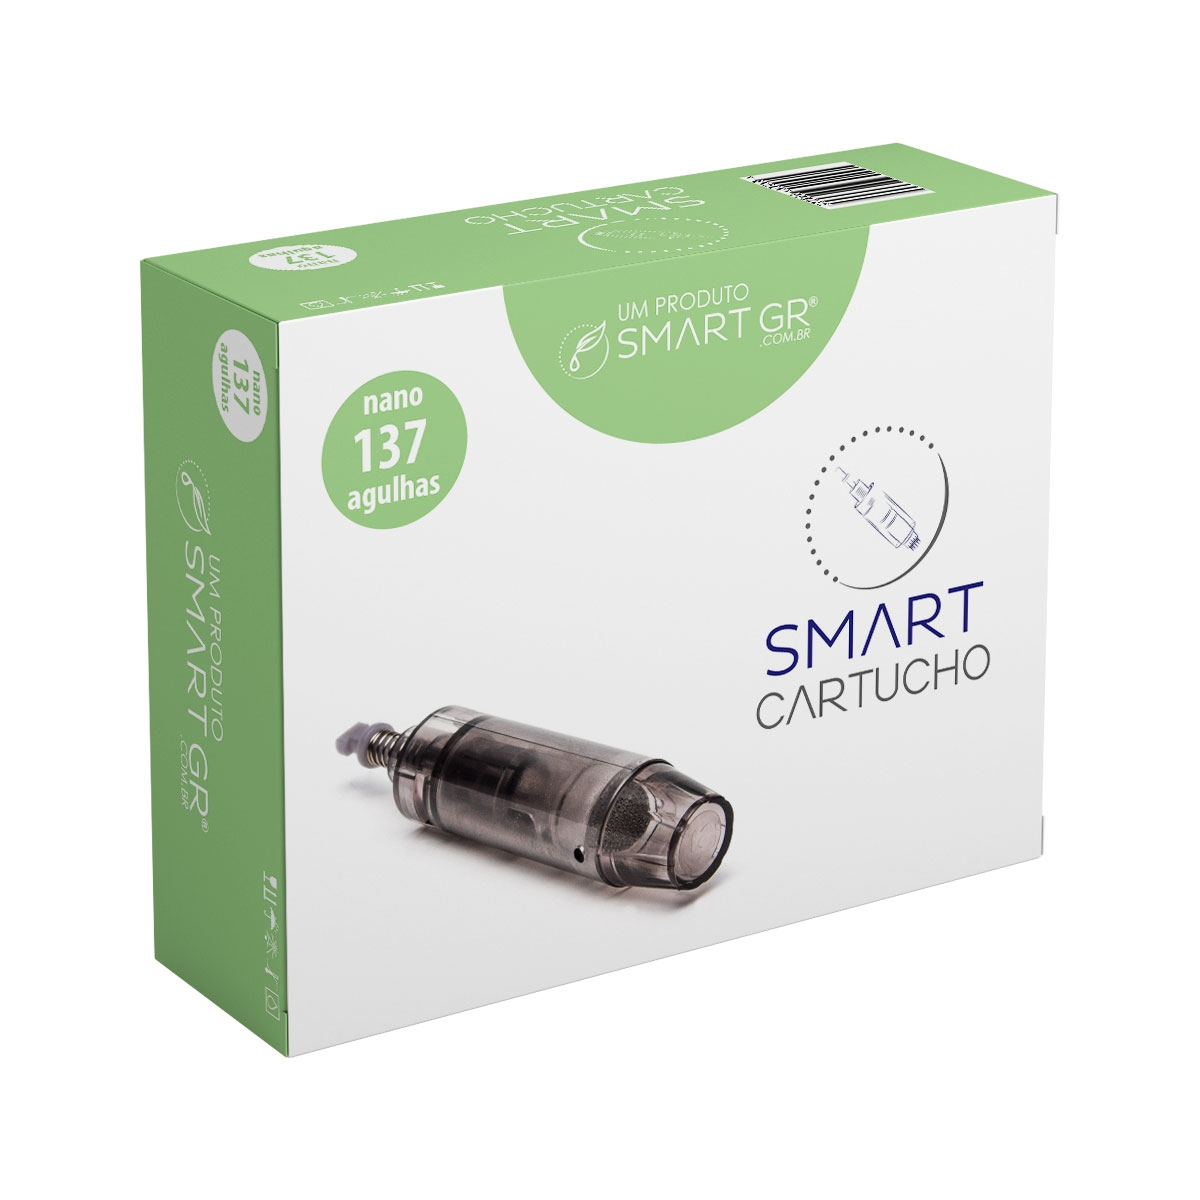 Cartucho Smart Derma Pen 137 agulhas (nano) - Vendido a Unidade  - HB FISIOTERAPIA